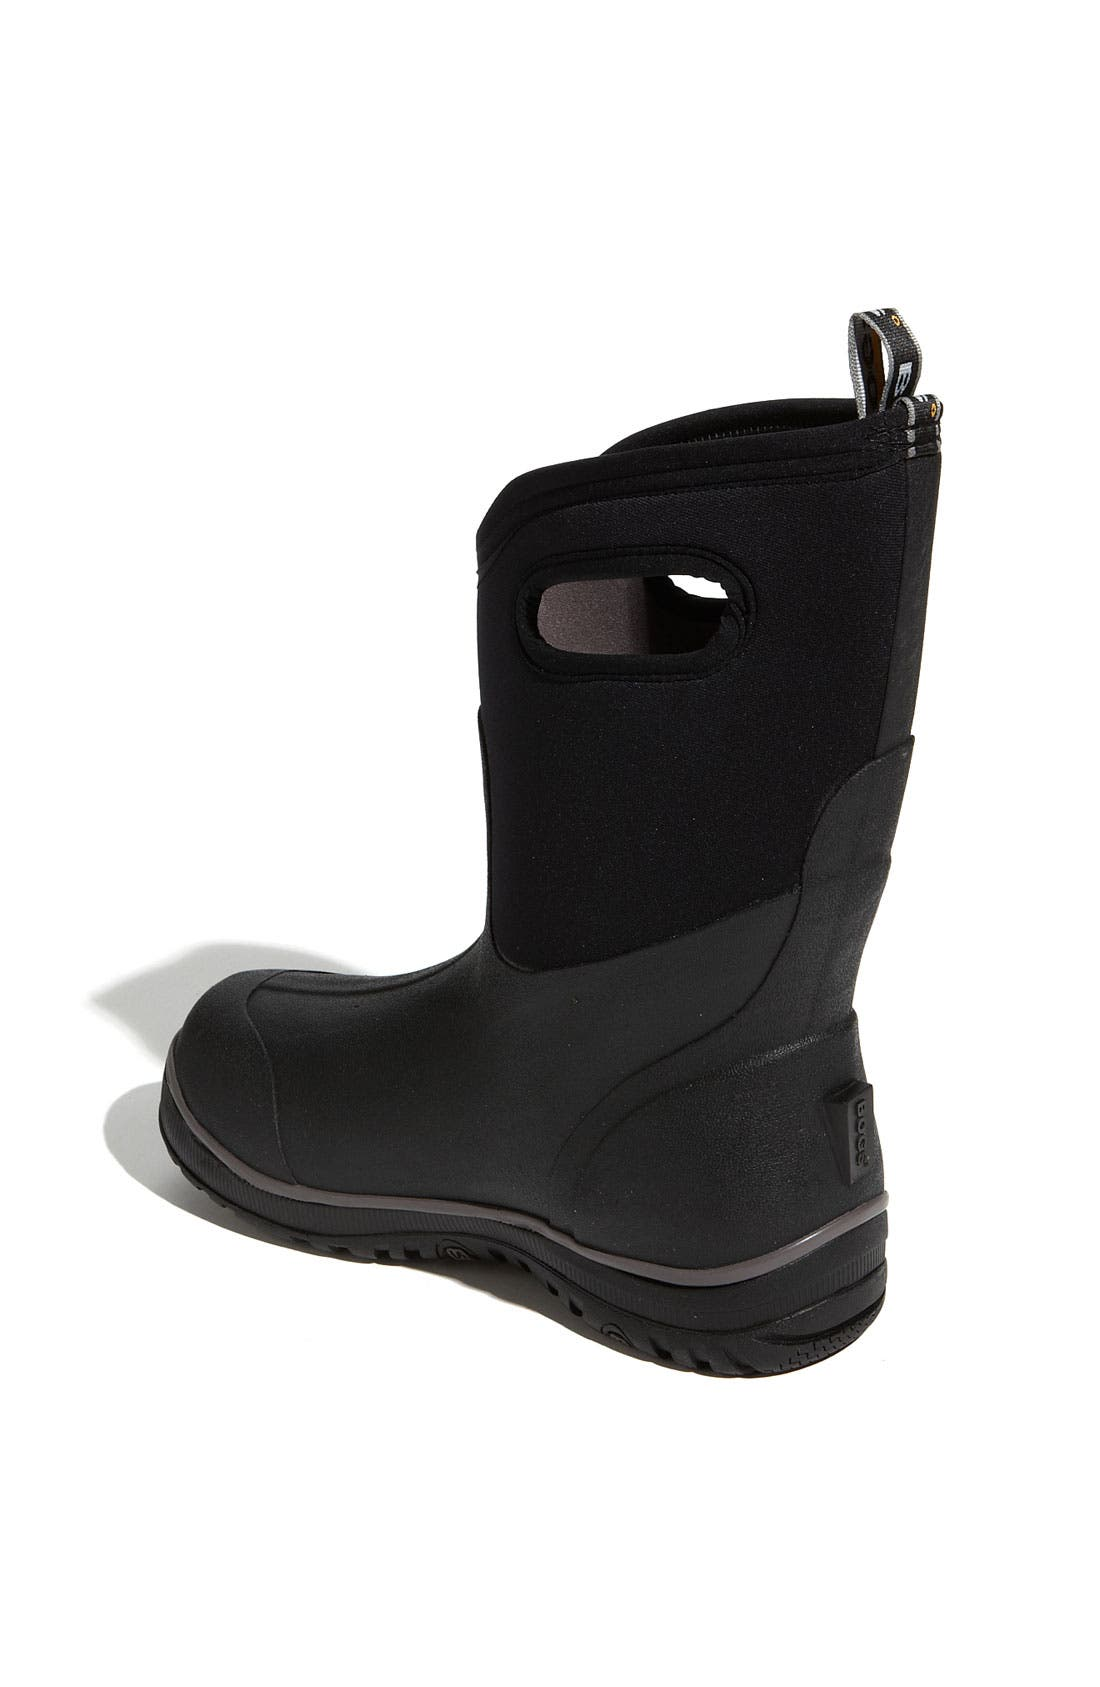 Alternate Image 2  - Bogs 'Classic Ultra' Mid High Rain Boot   (Men)